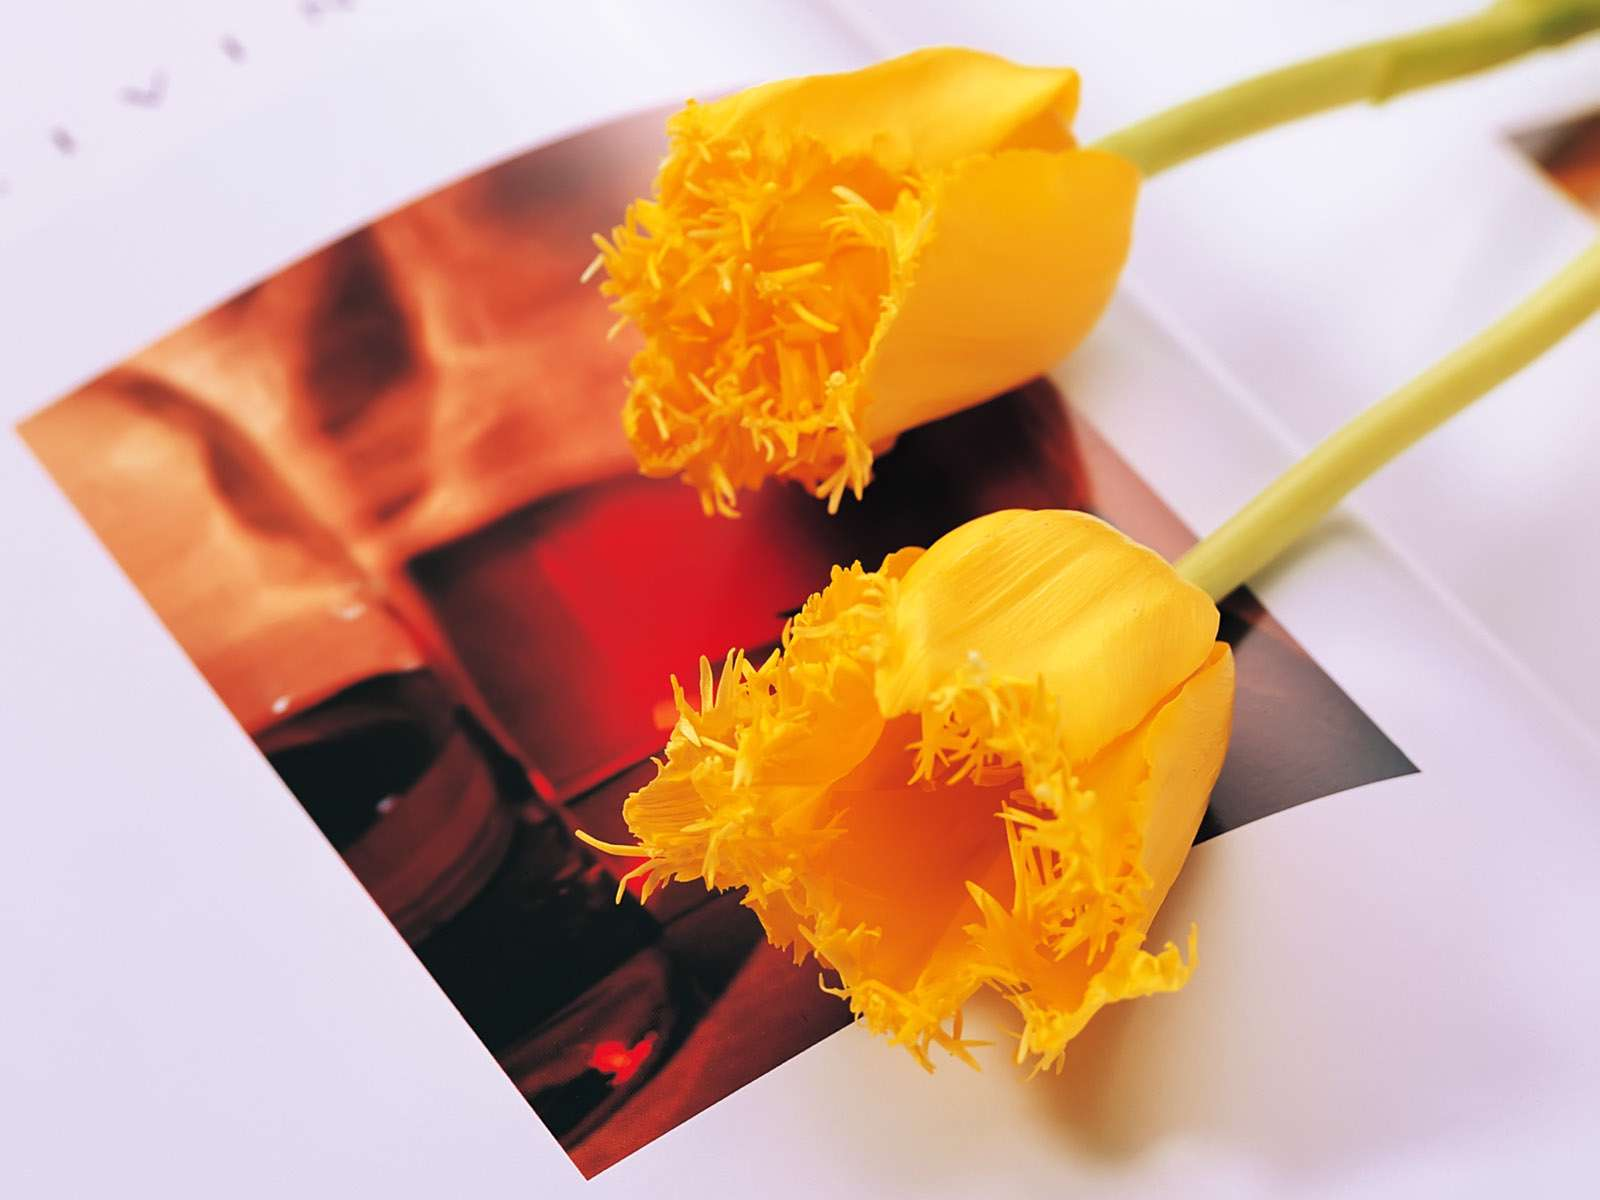 عکس گل لاله زرد رنگ   گالری عکس